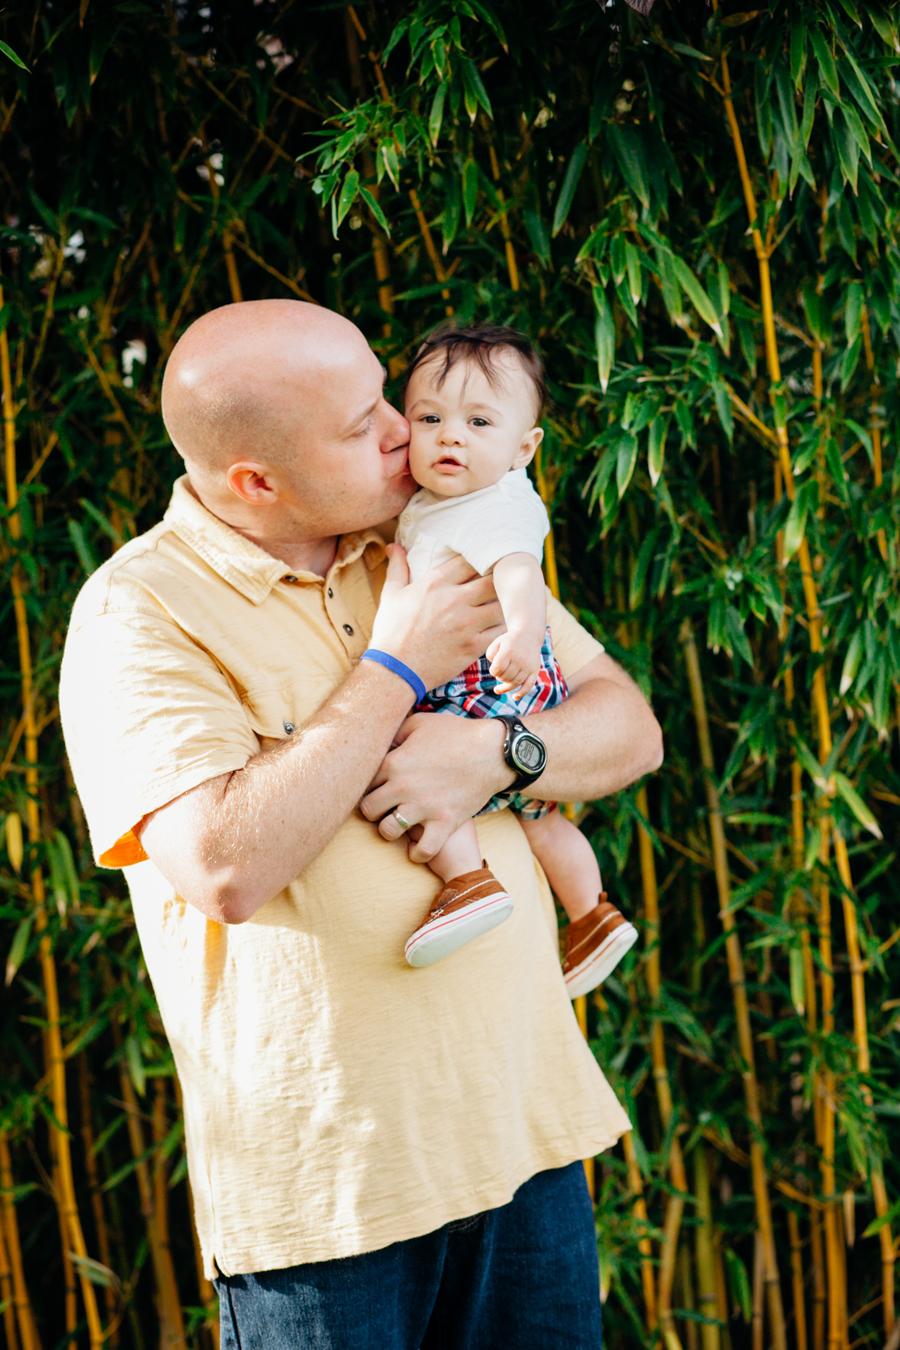 024-theo-six-months-family-session-katheryn-moran-photography-portland.jpg